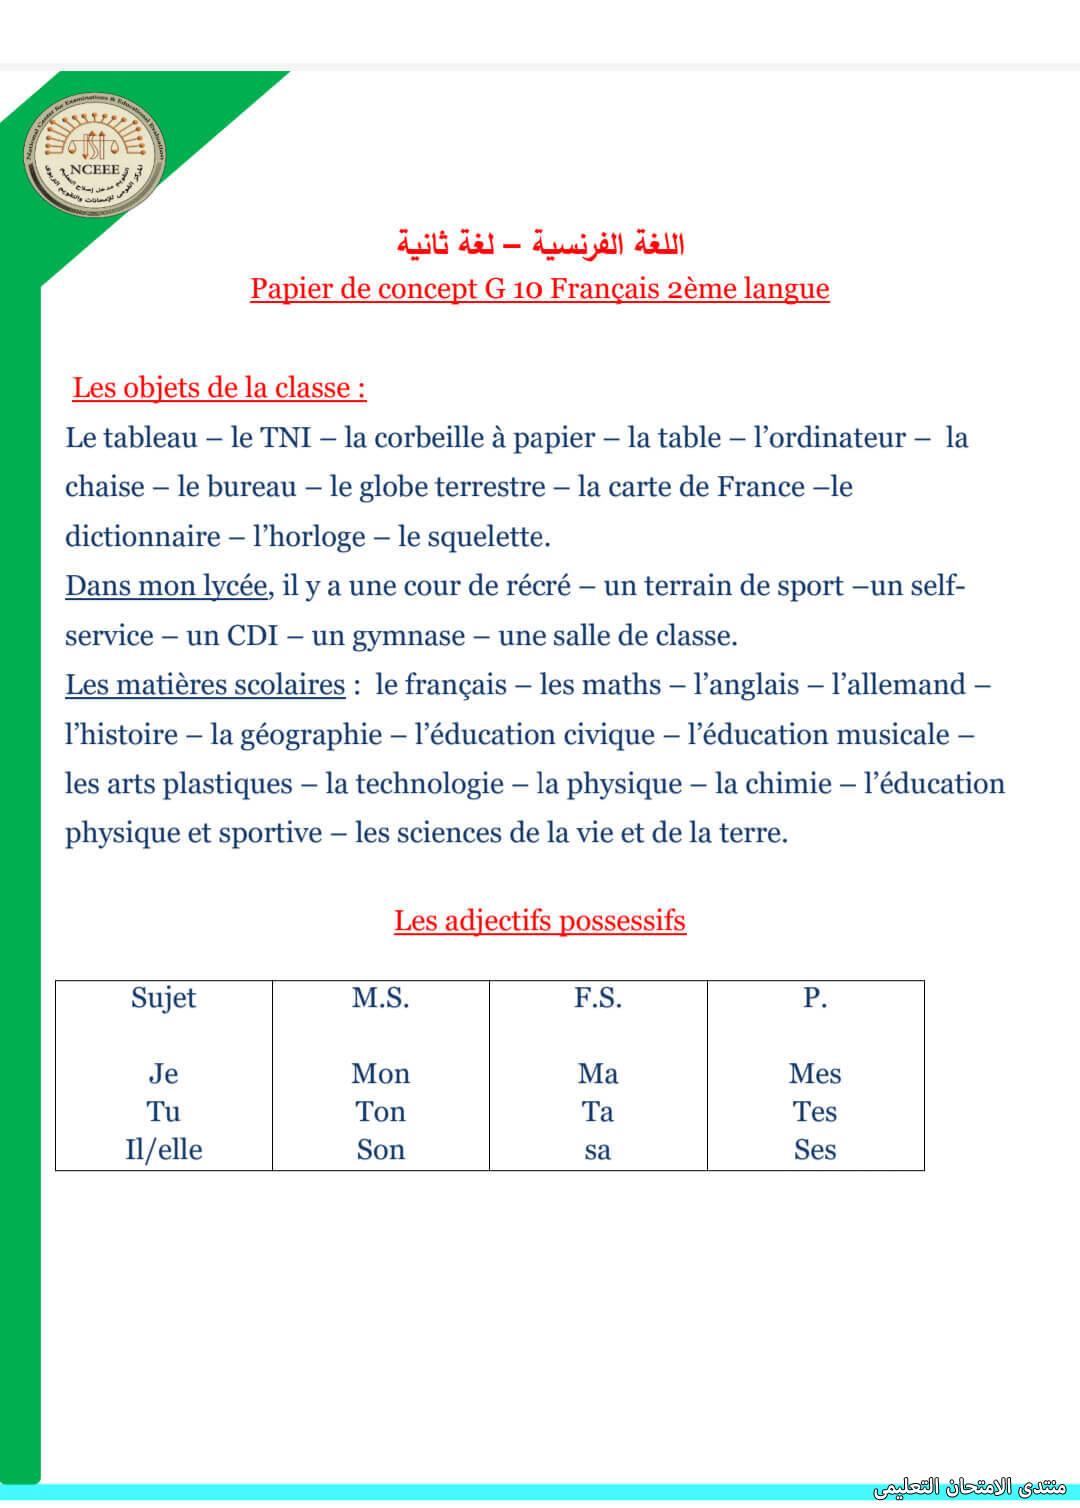 exam-eg.com_1619306733710816.jpg